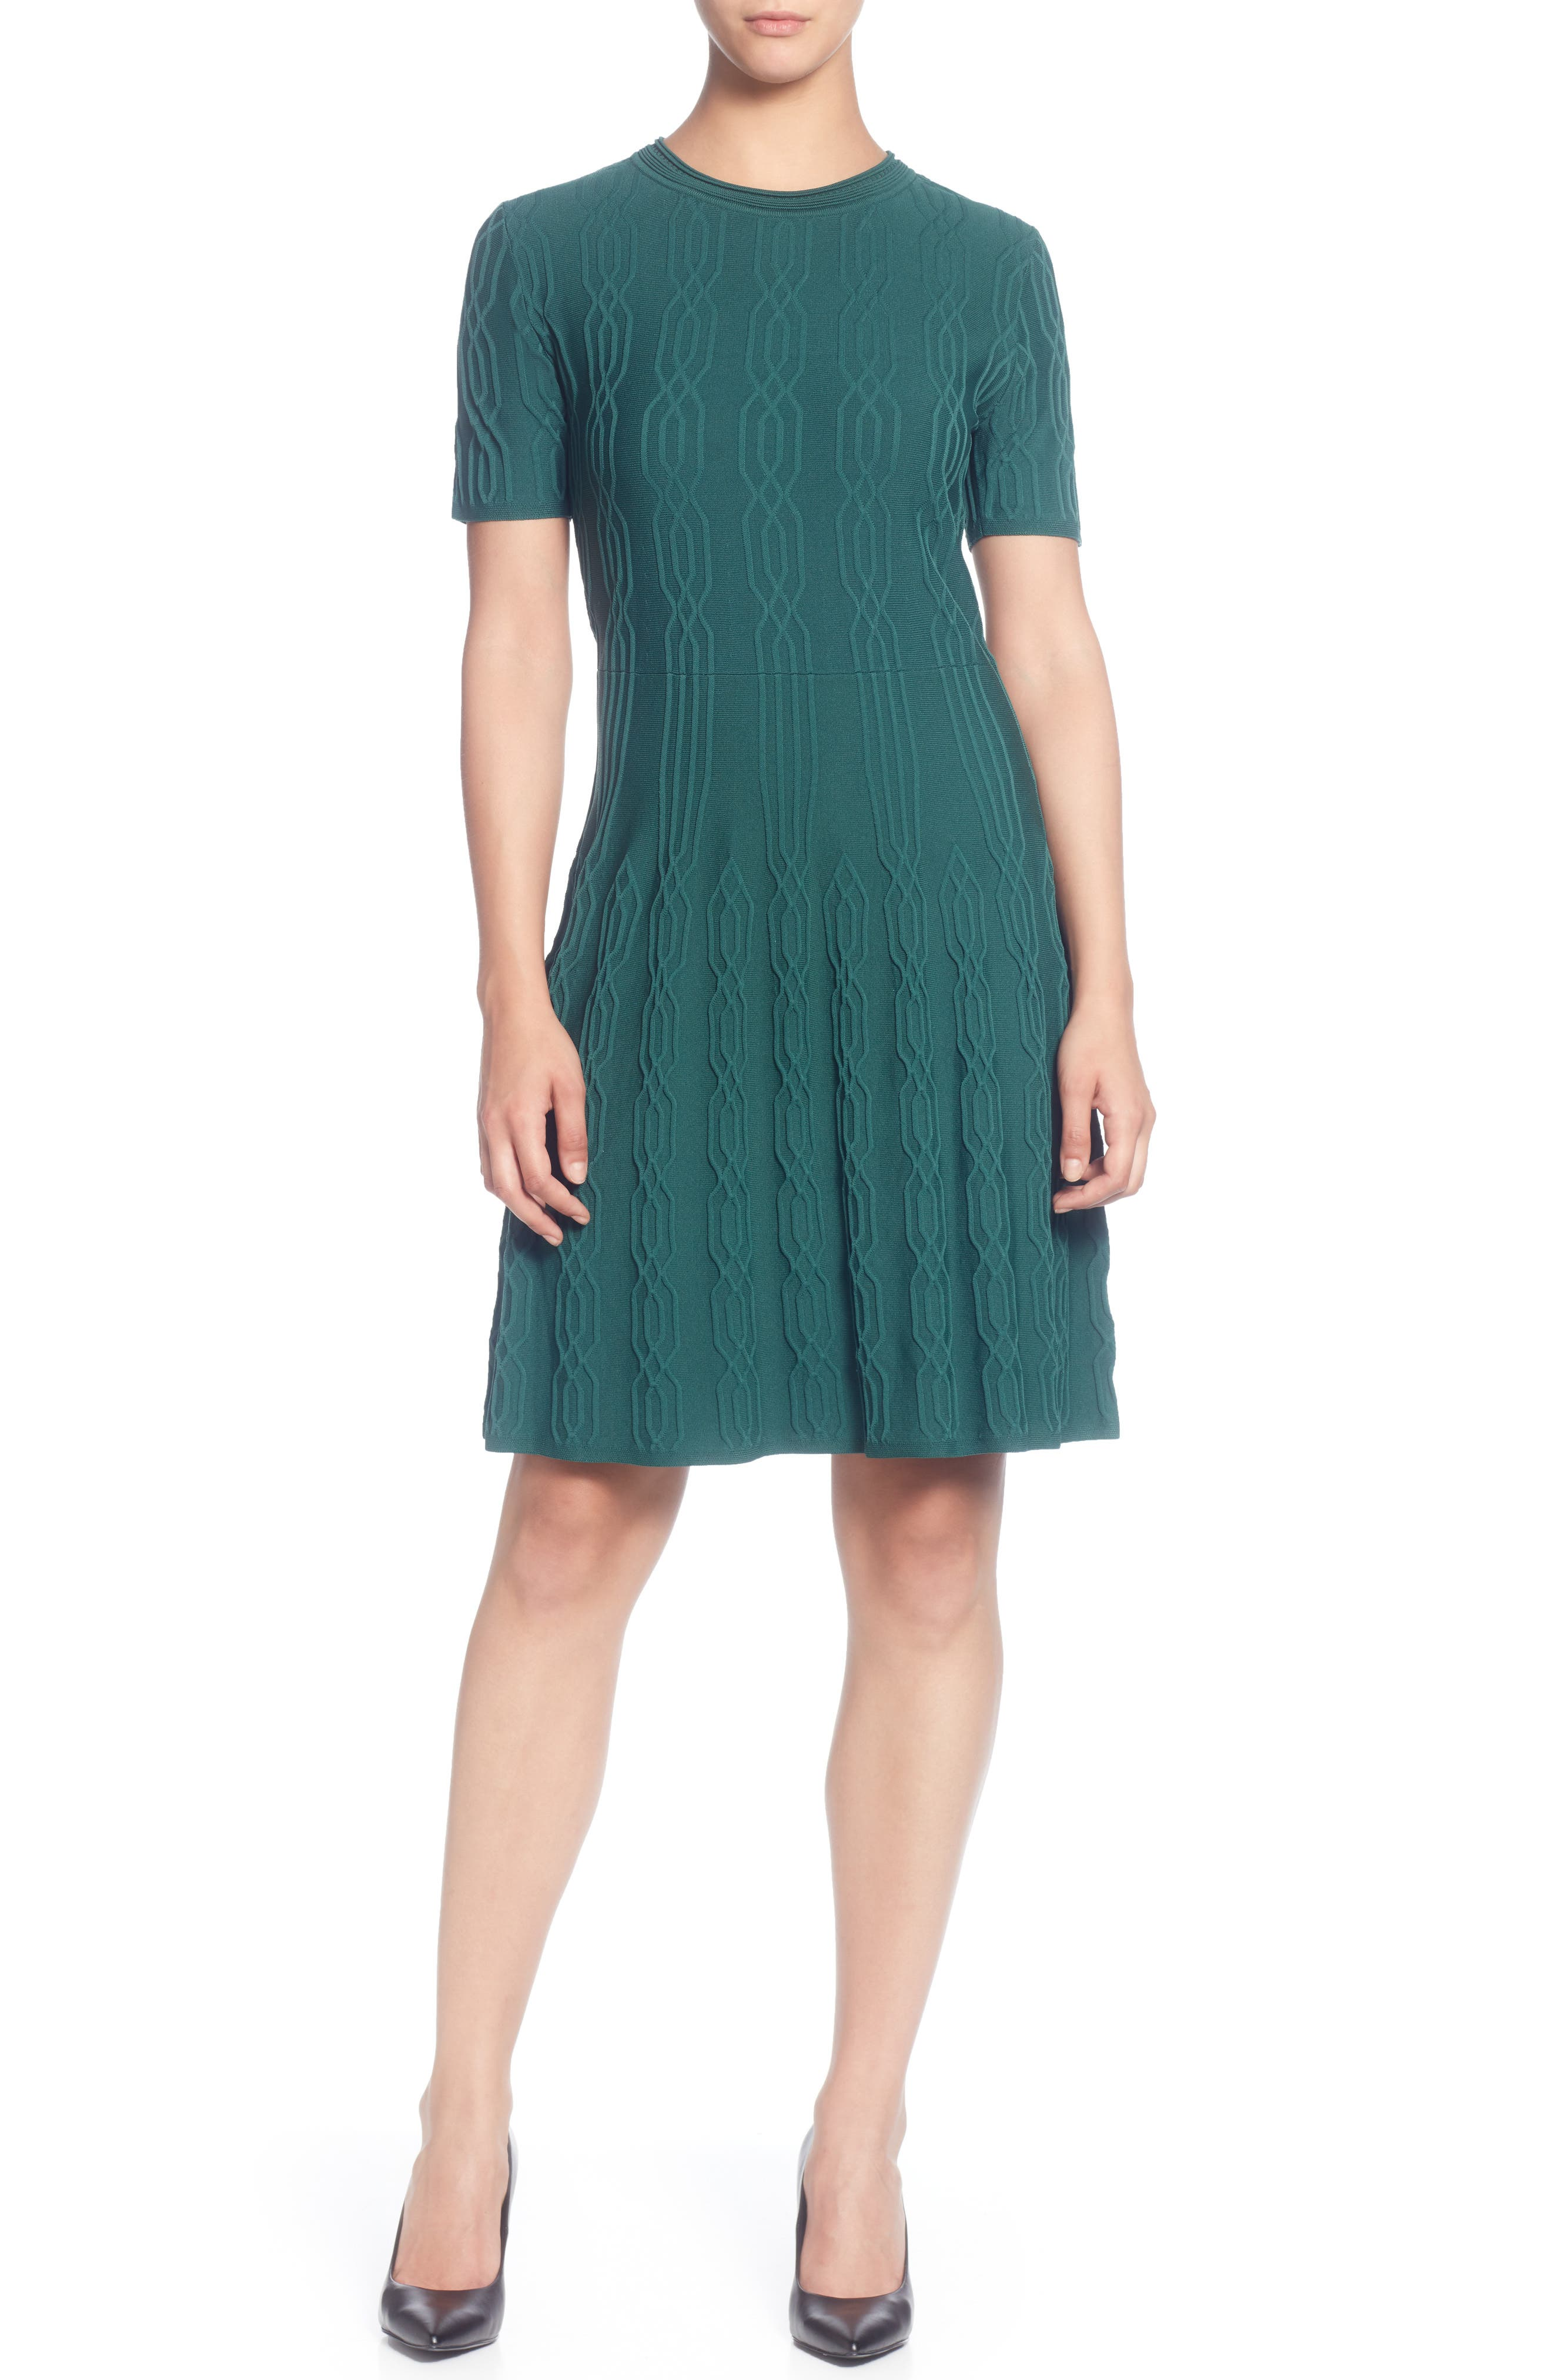 CATHERINE CATHERINE MALANDRINO Jacquard Sweater Dress, Main, color, JUNE BUG